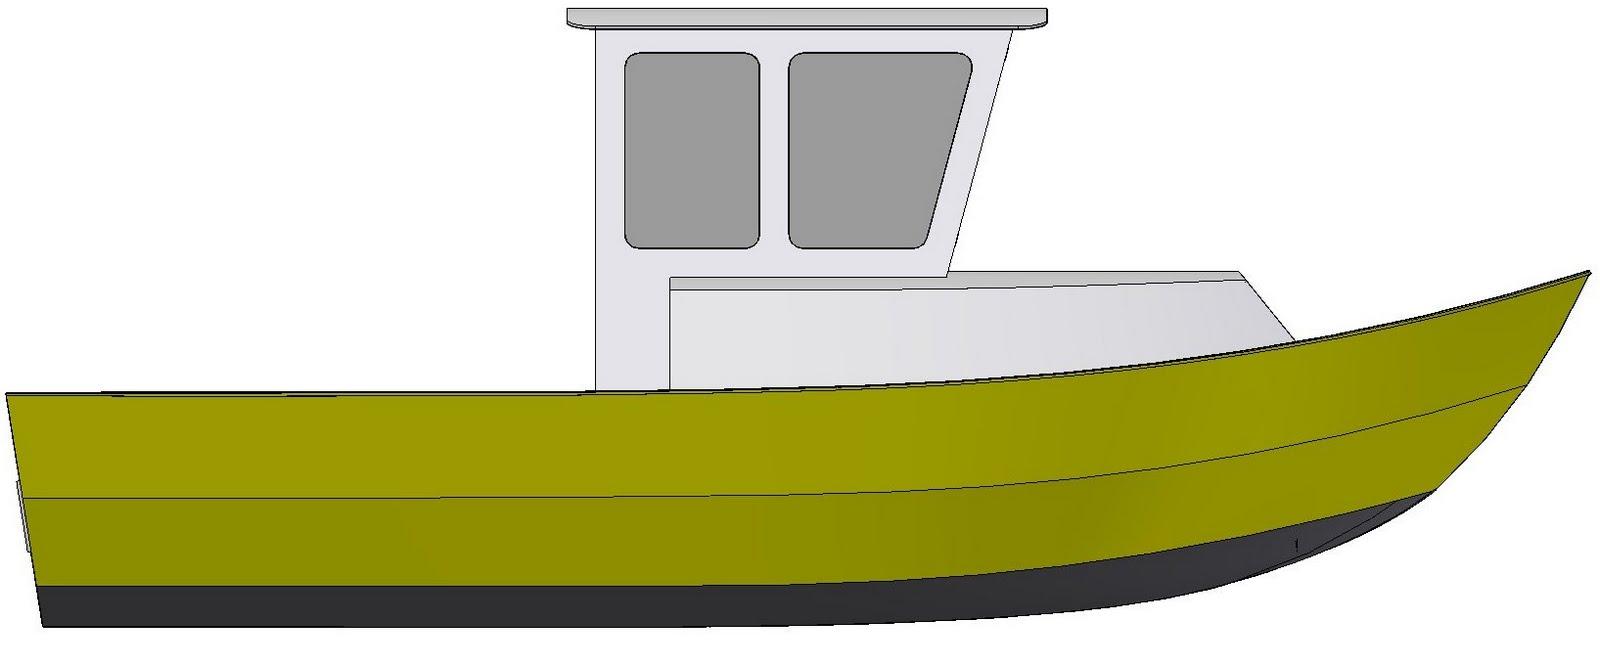 galeria de barcos: